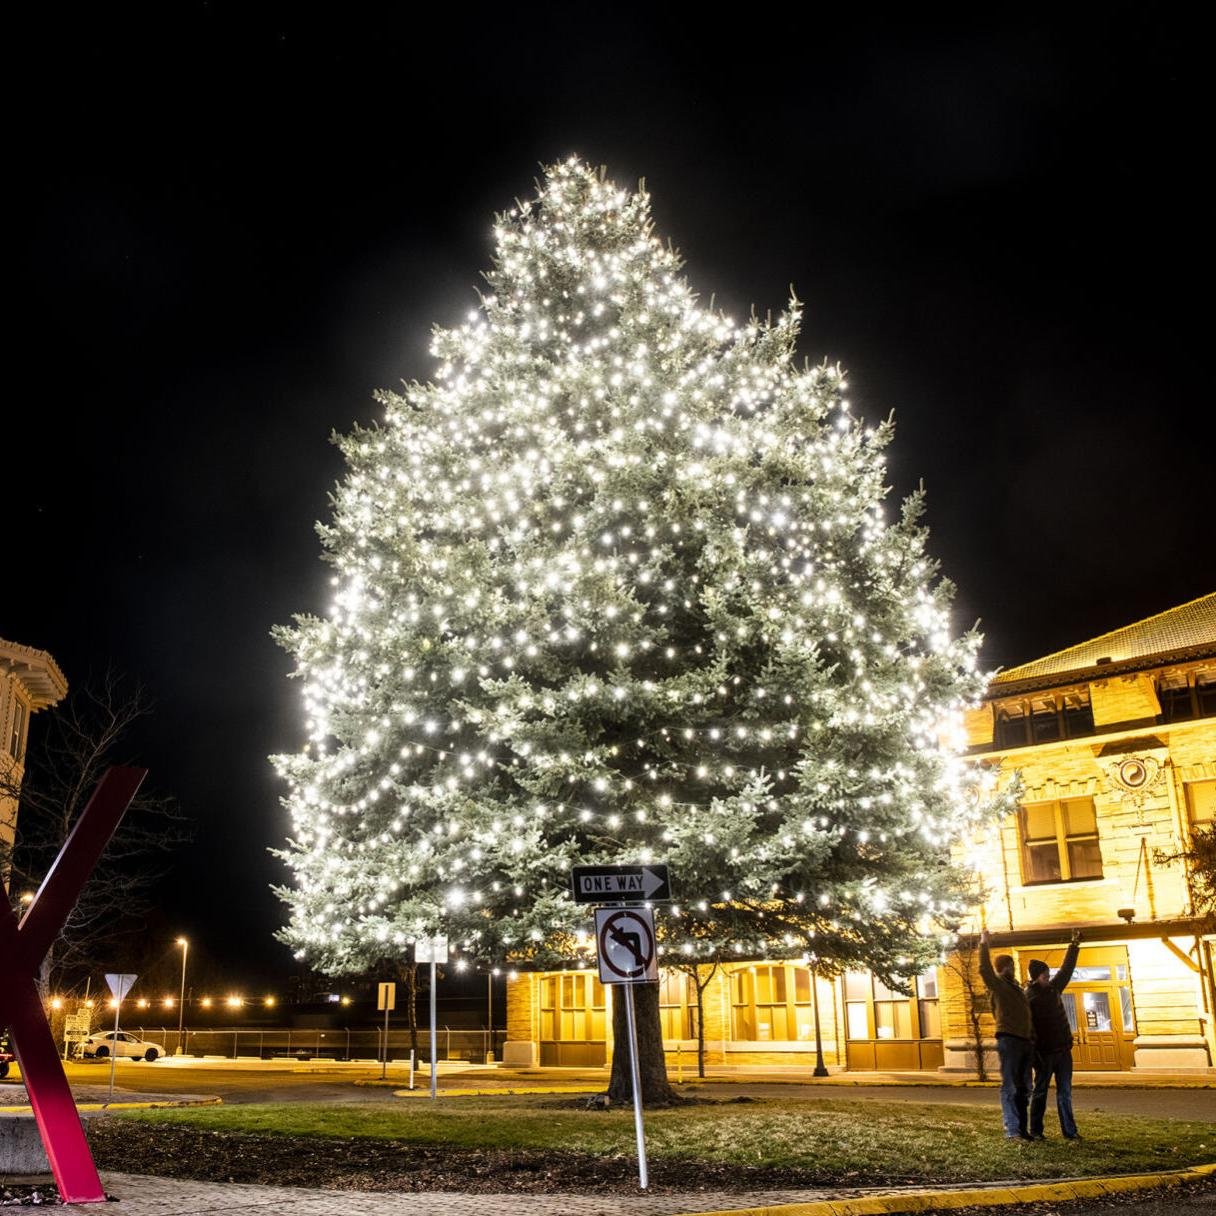 Christmas Missoula 2021 Holidays Amid Covid 19 Missoula Celebrations Look Different Than Years Past Local News Missoulian Com